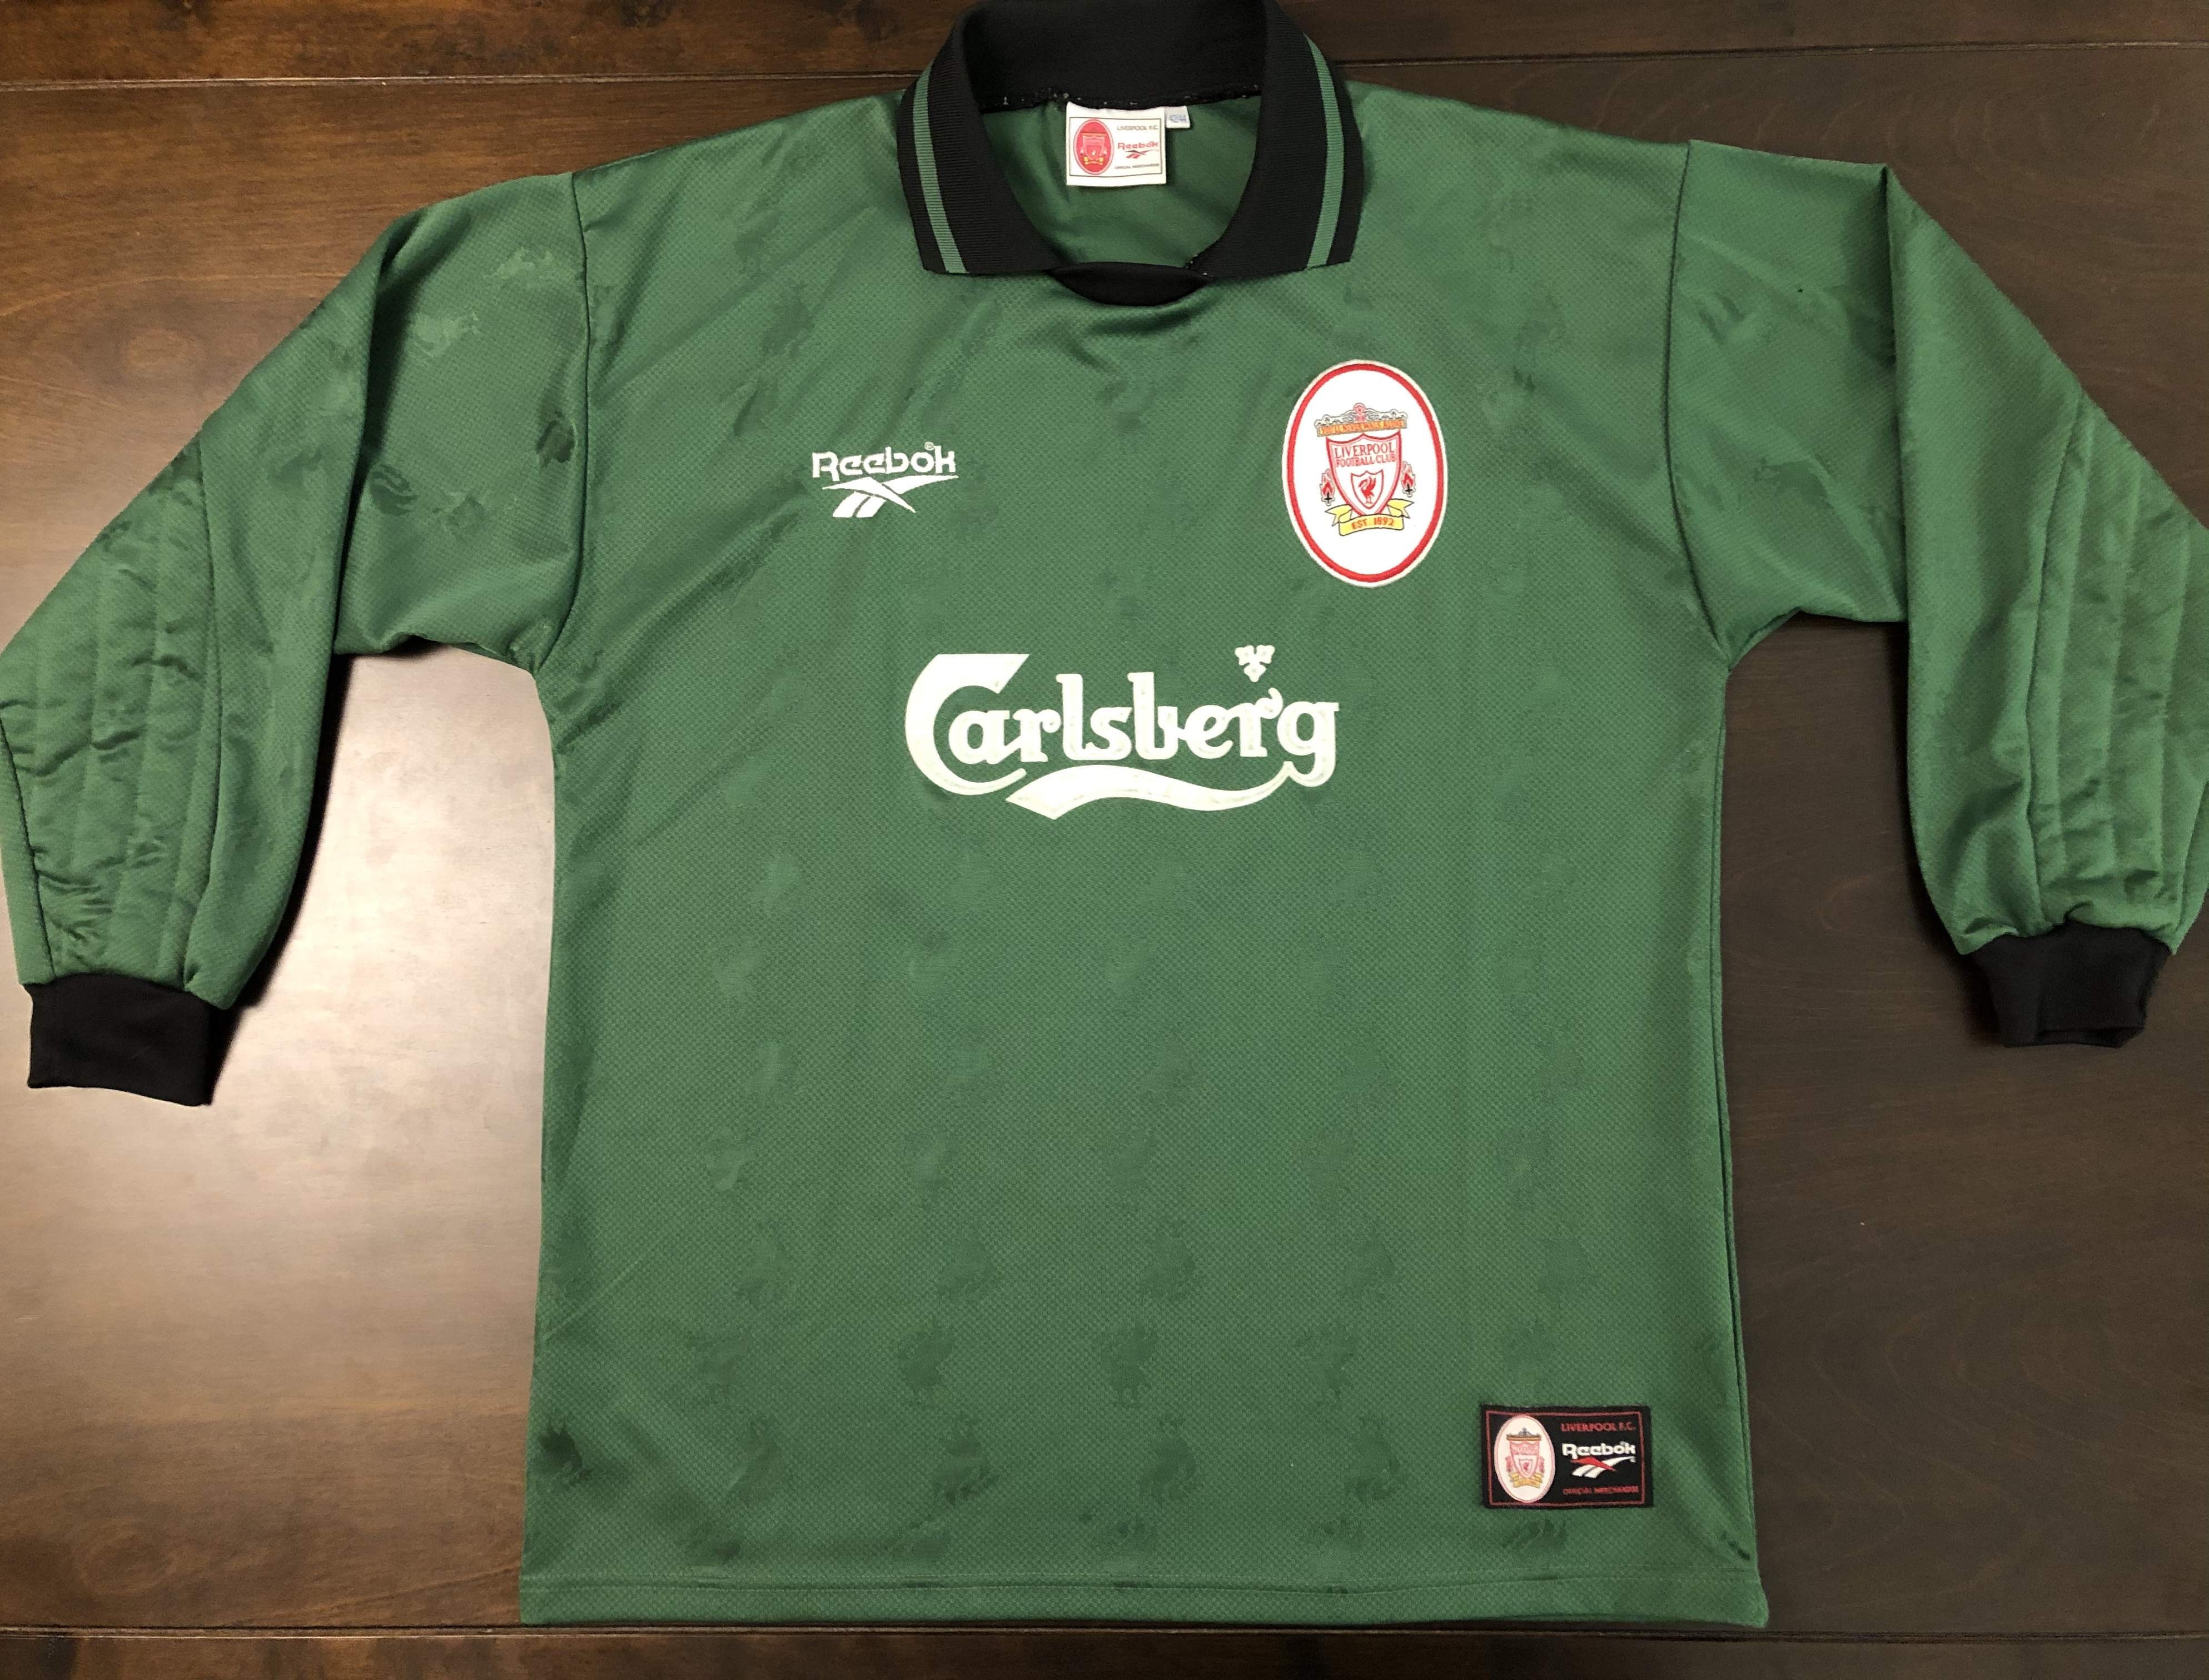 Vintage 1996 1998 Rare Liverpool Long Sleeve Goalkeeper Jersey L Grailed